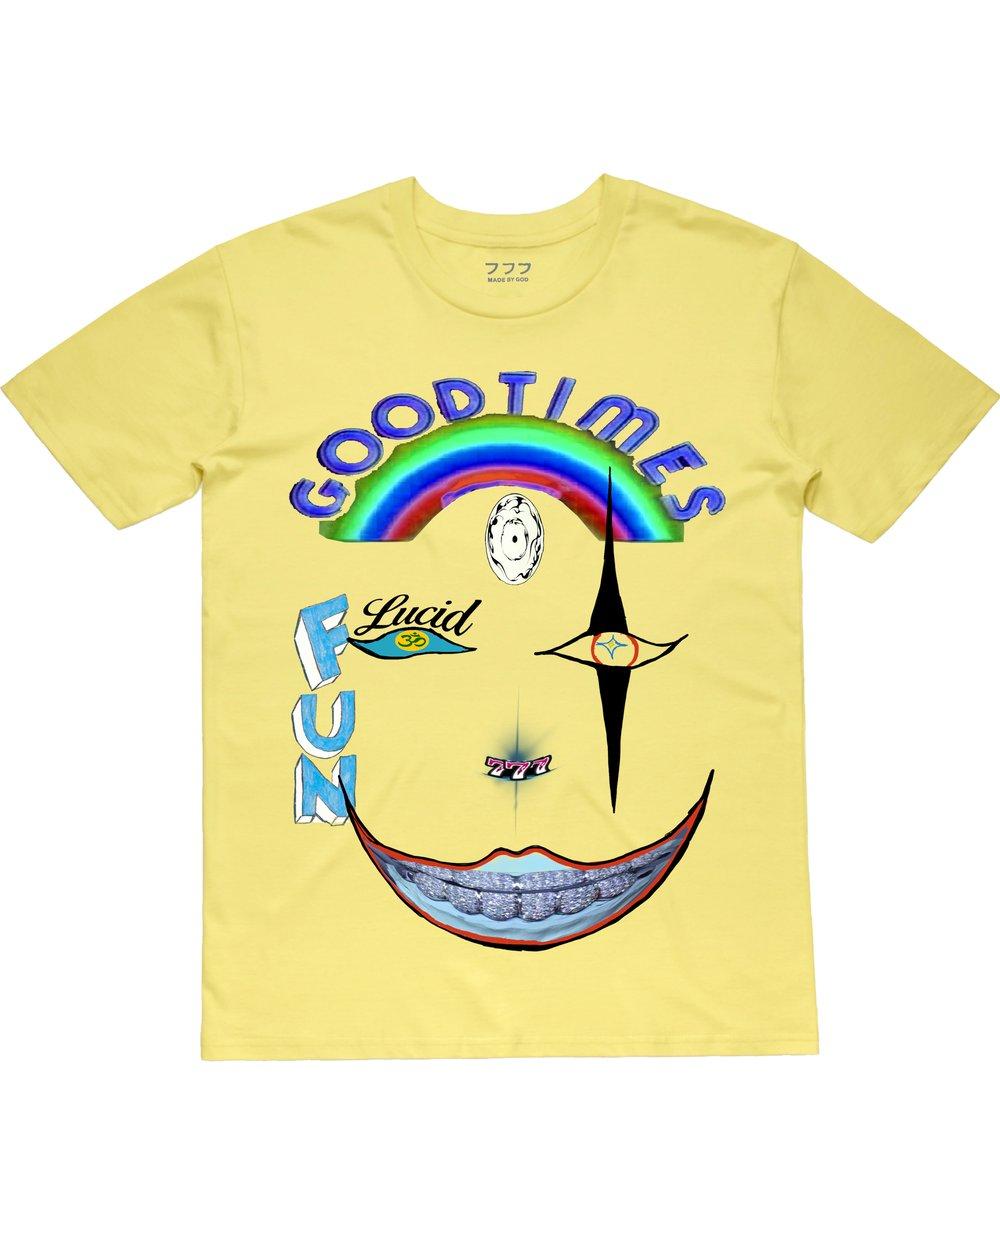 Image of GOODTIMES TEE (SUN YELLOW)